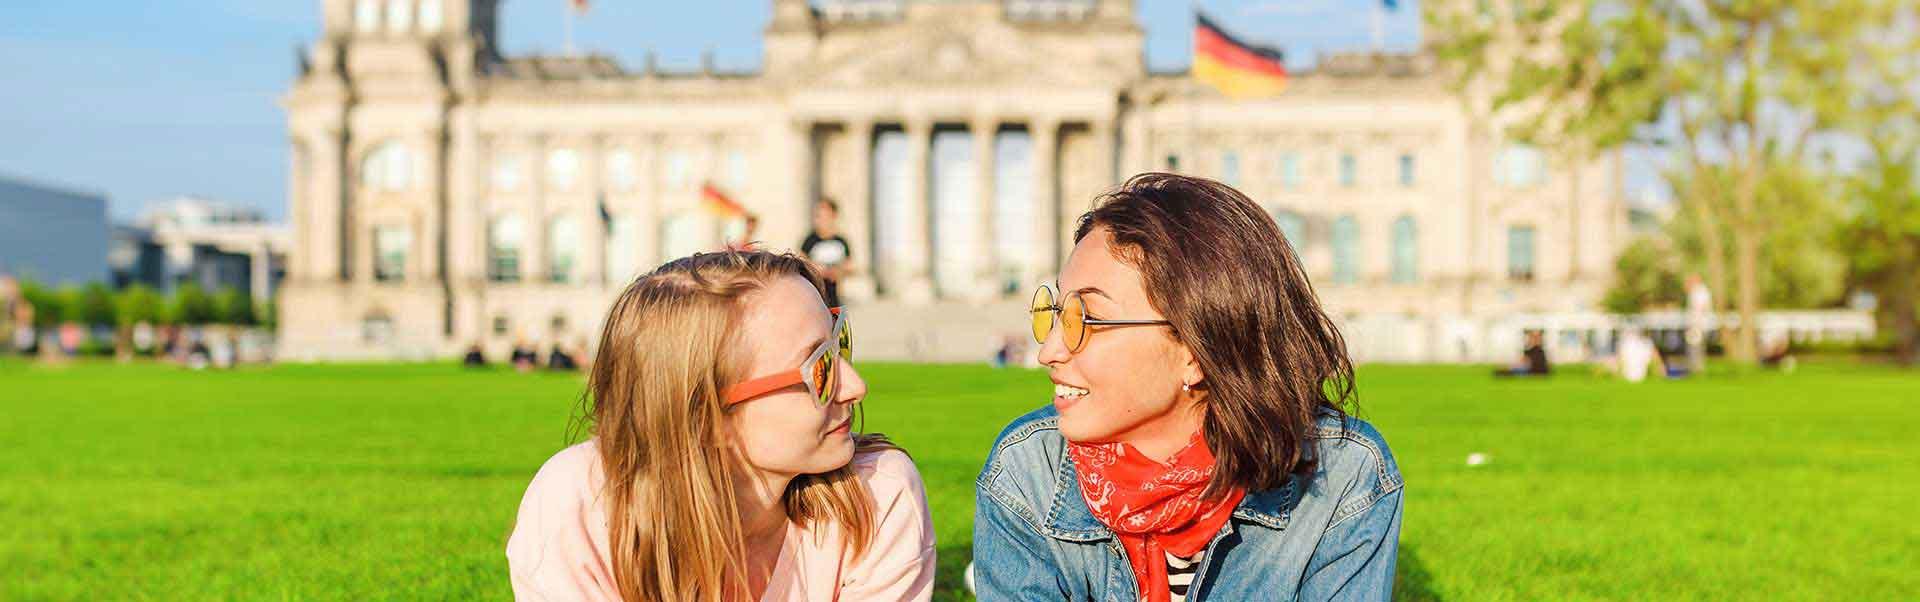 2019 Educatius High School Programs in Germany for International Students